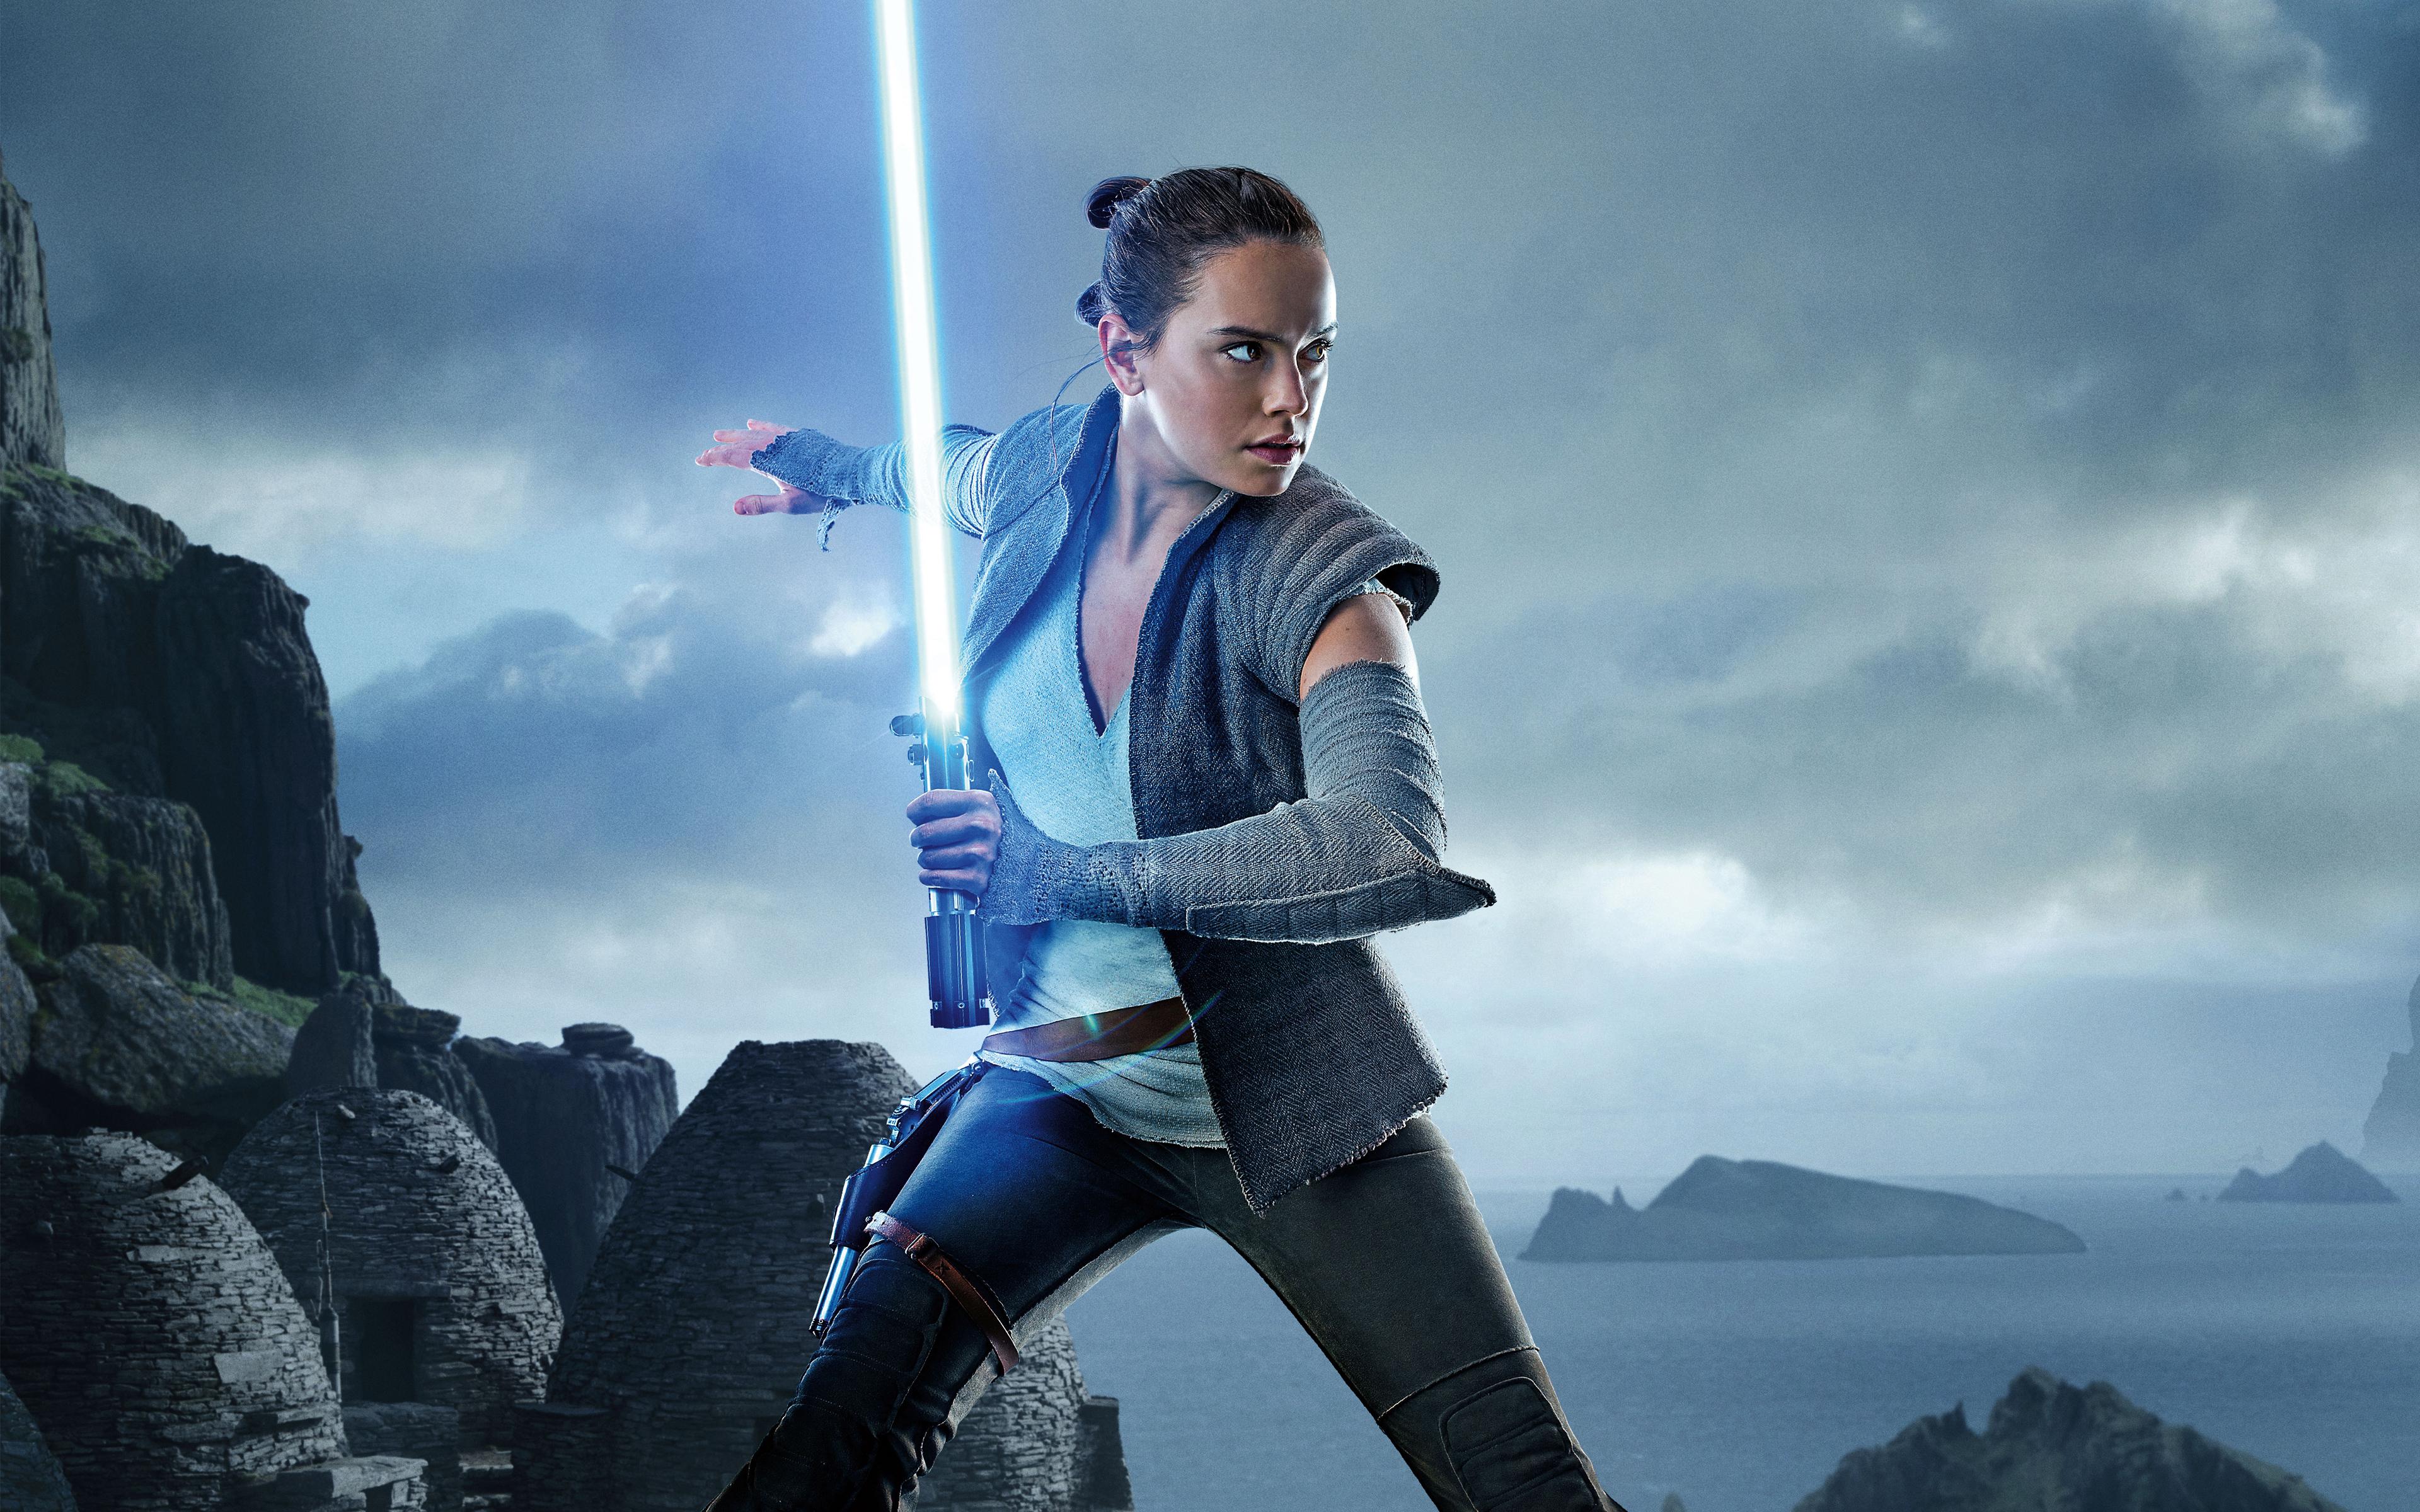 Rey Star Wars - Star Wars Rey Fighting , HD Wallpaper & Backgrounds